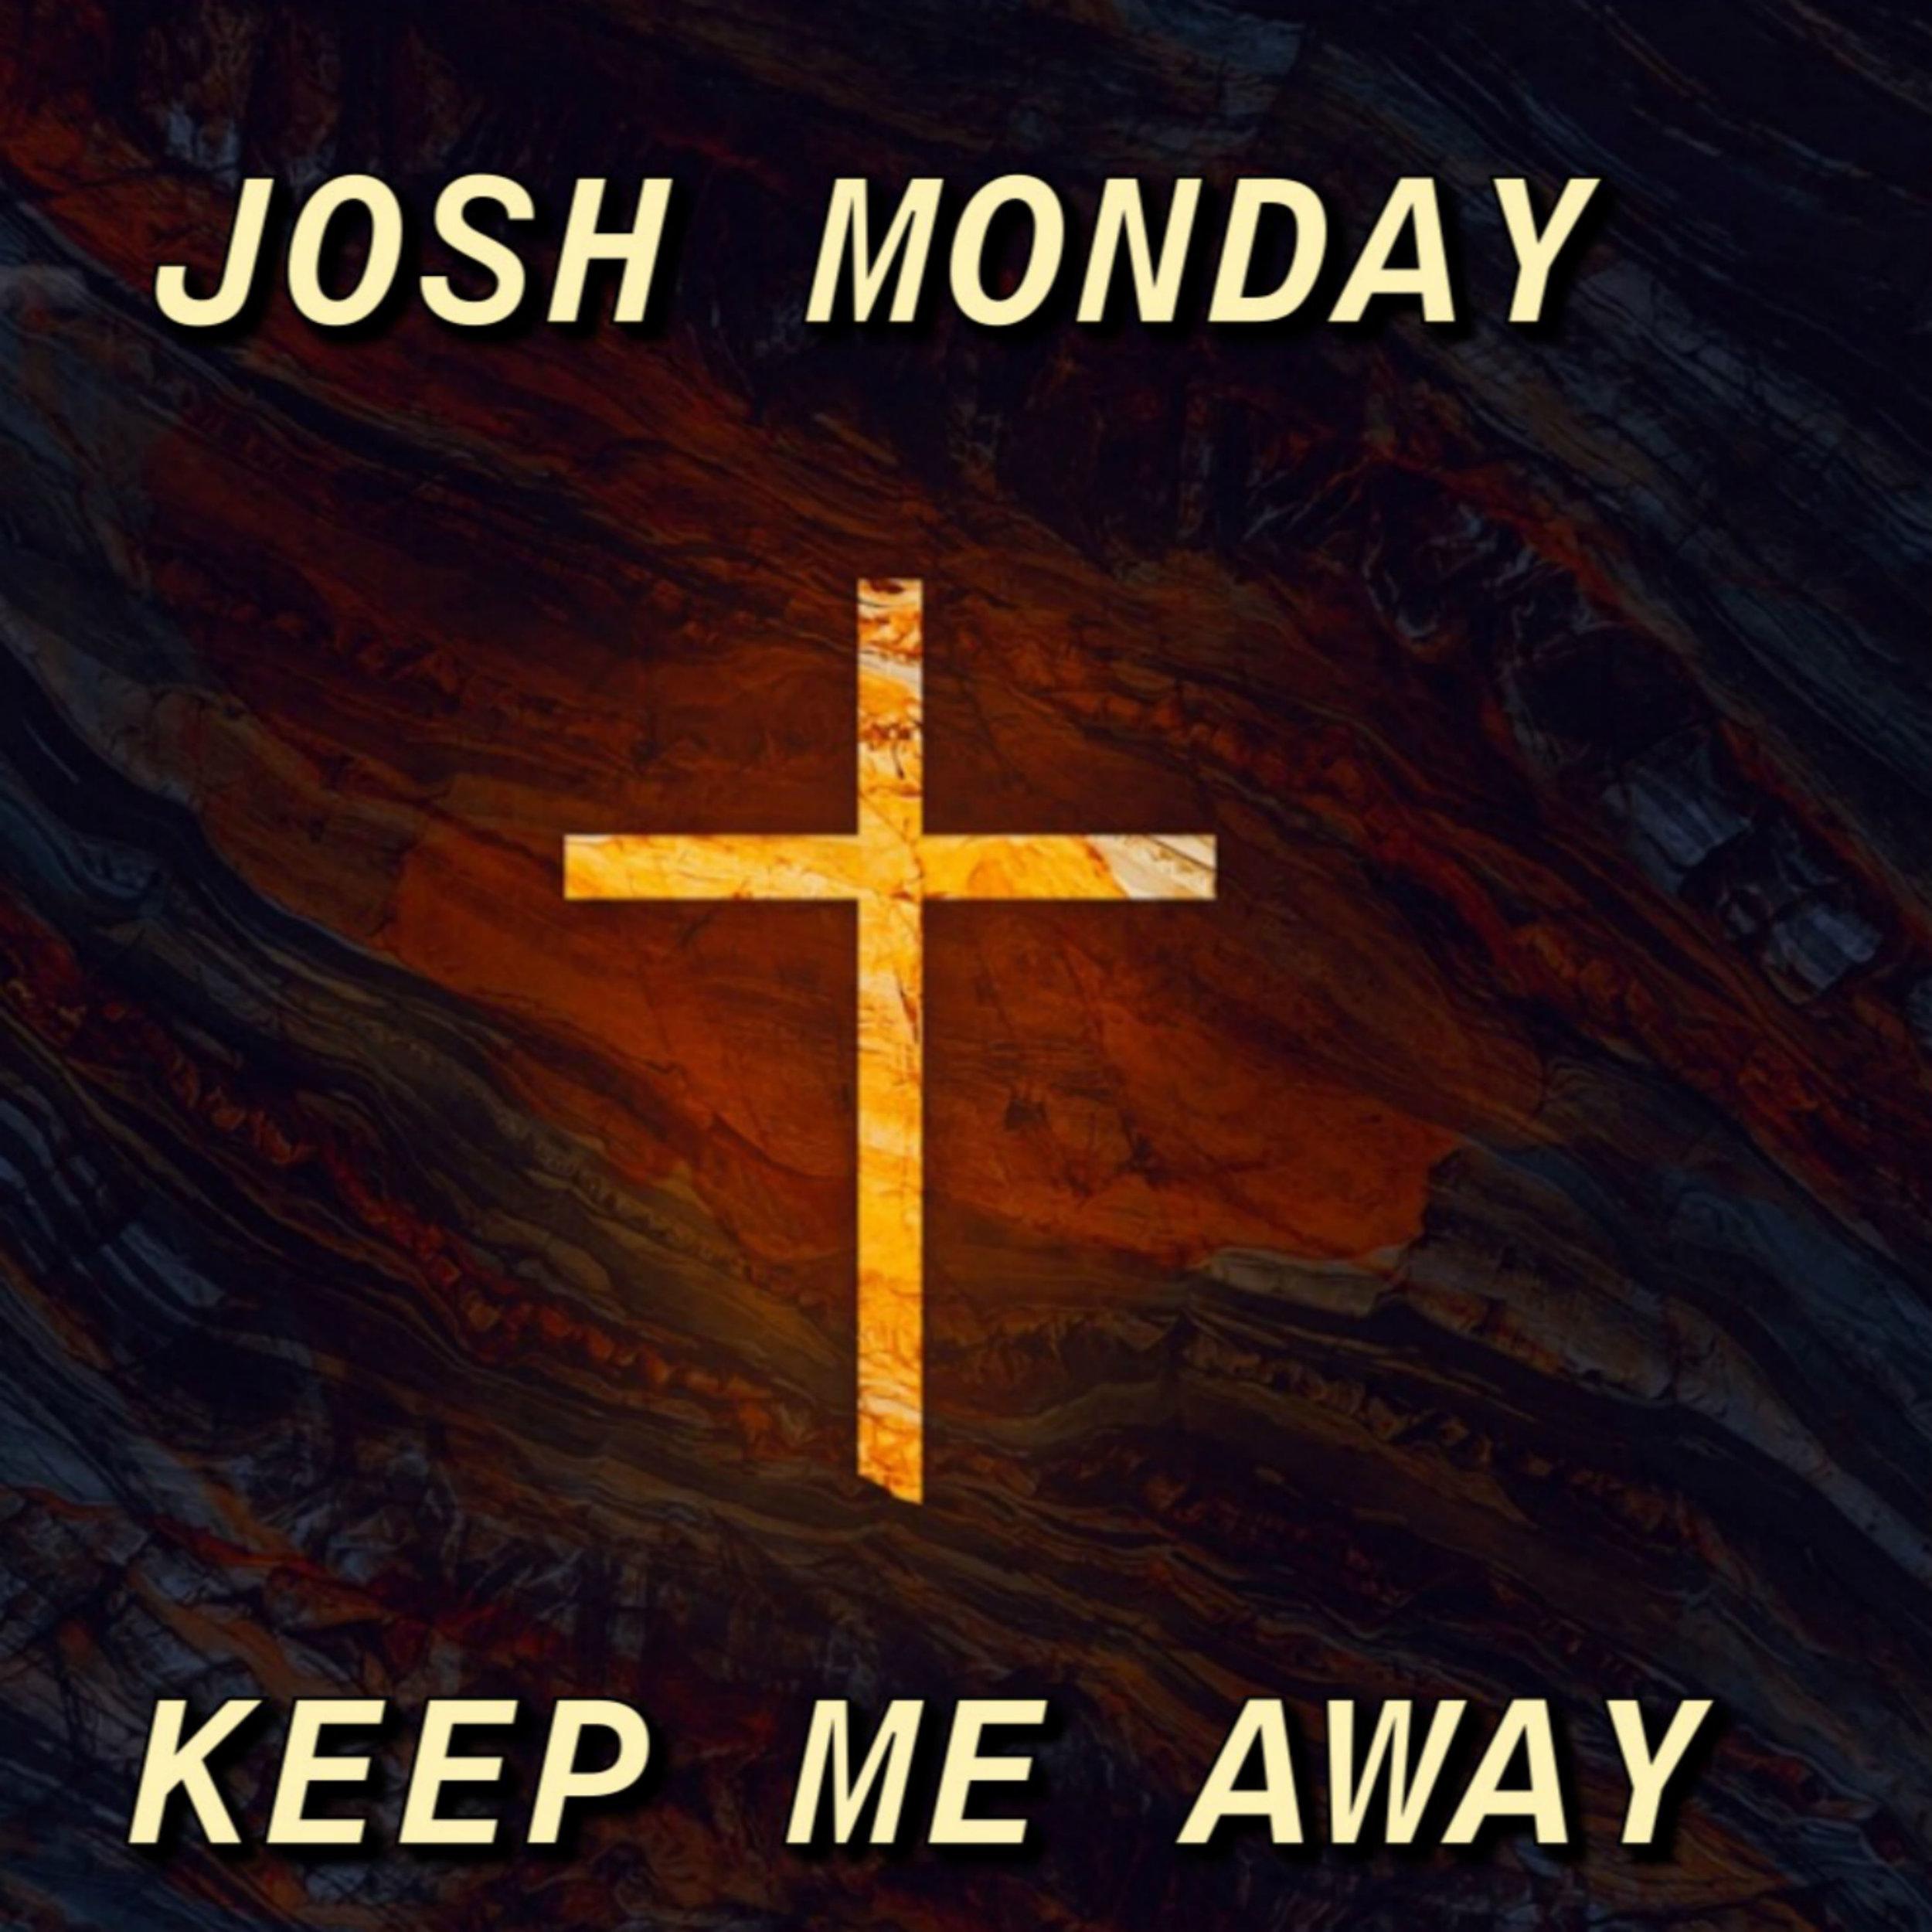 Joshua Monday Keep Me Away album cover.jpg